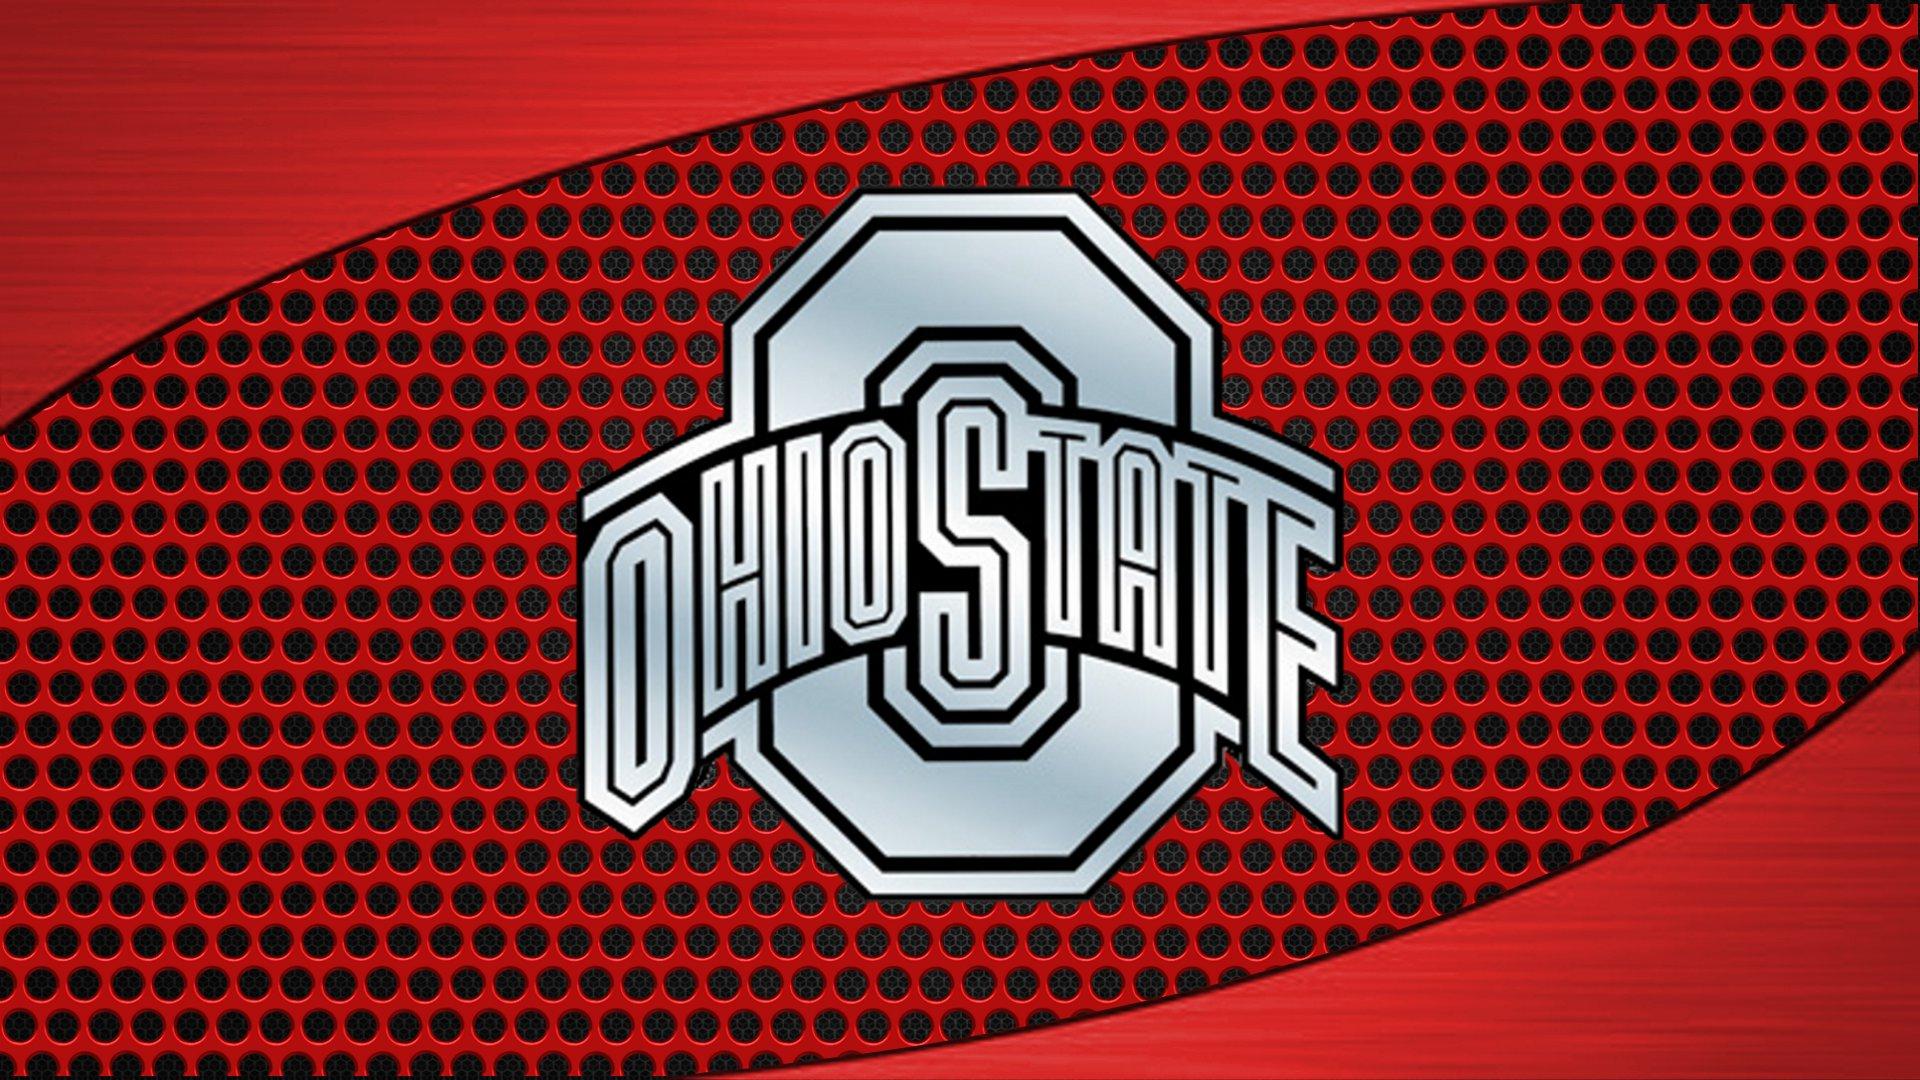 OSU Wallpaper 333 - Ohio State Football Wallpaper ...